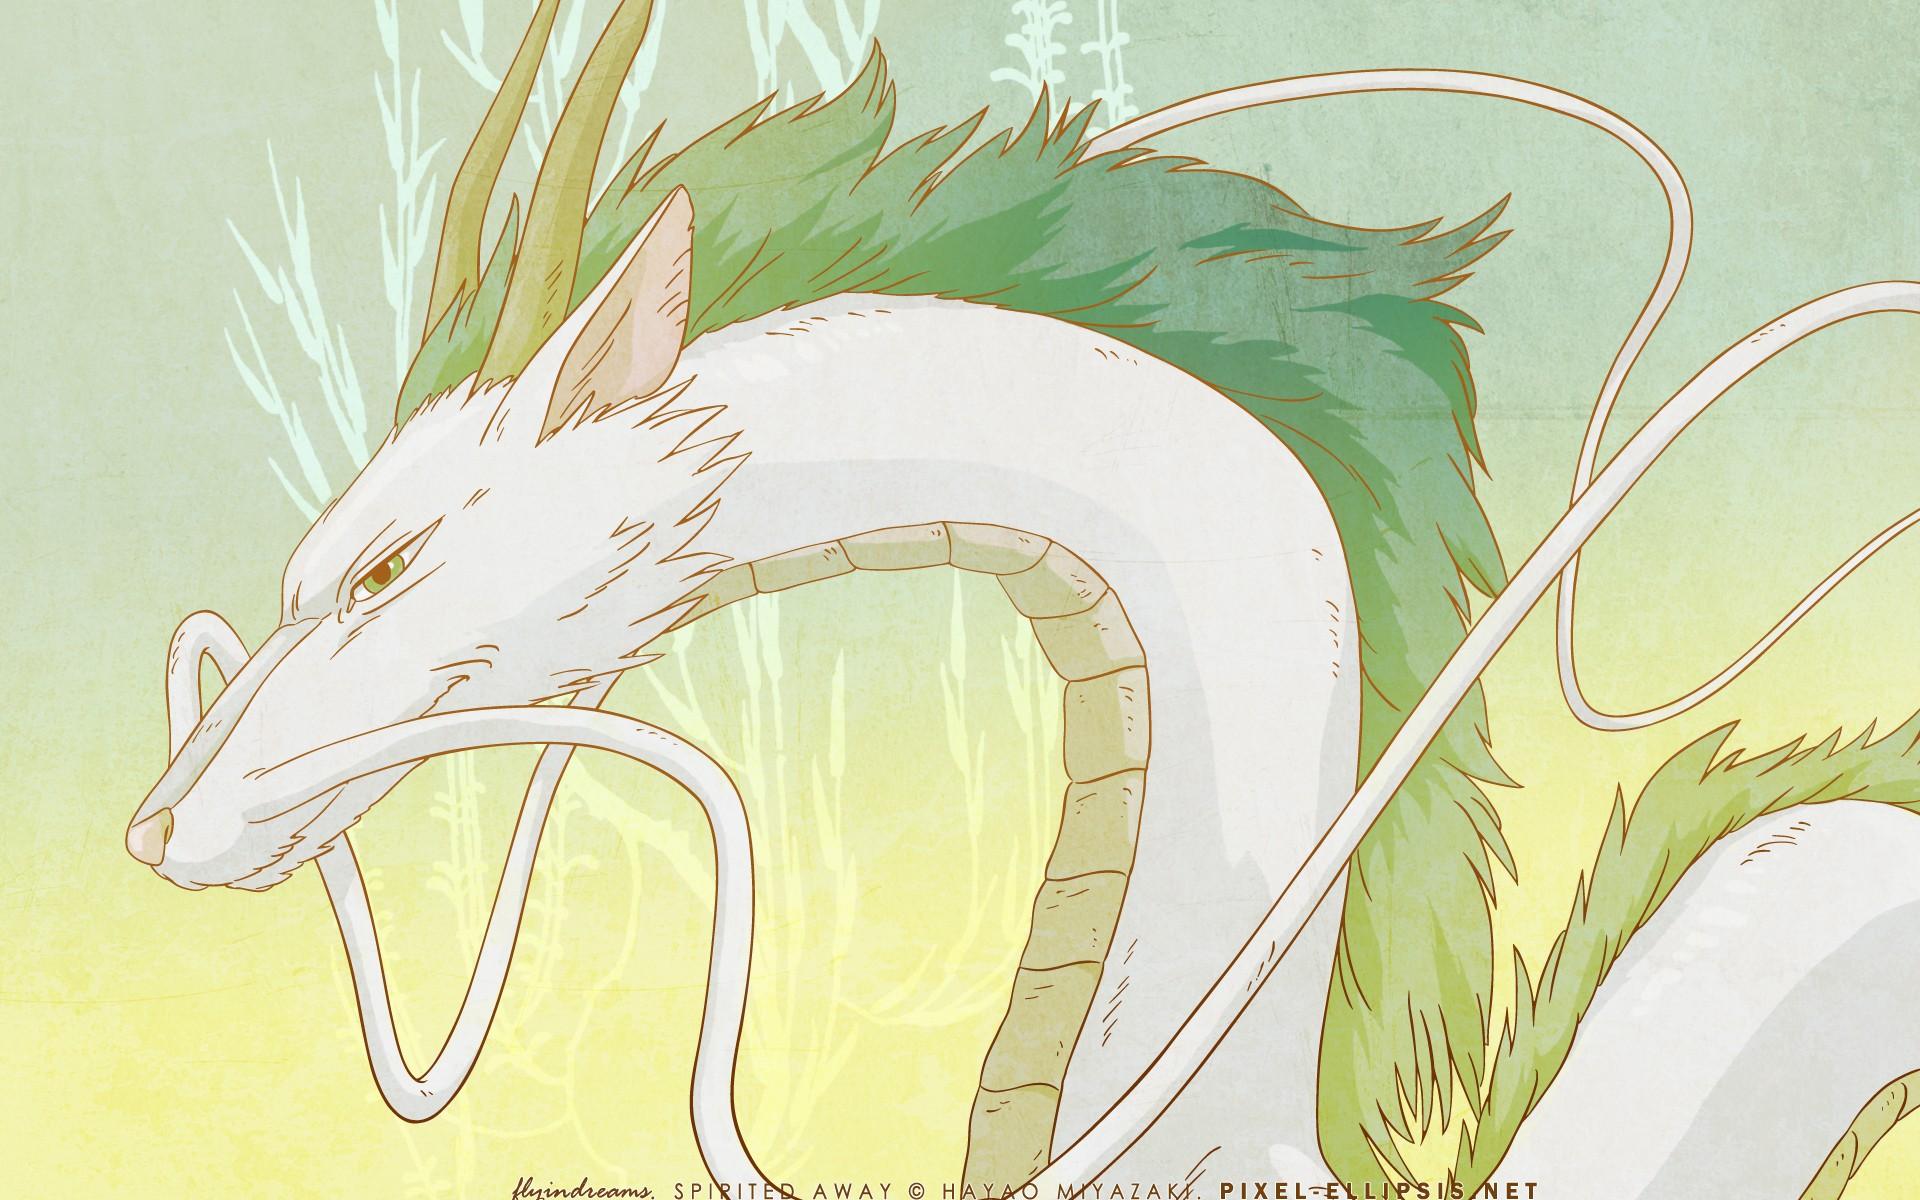 Anime 1920x1200 Studio Ghibli Spirited Away anime